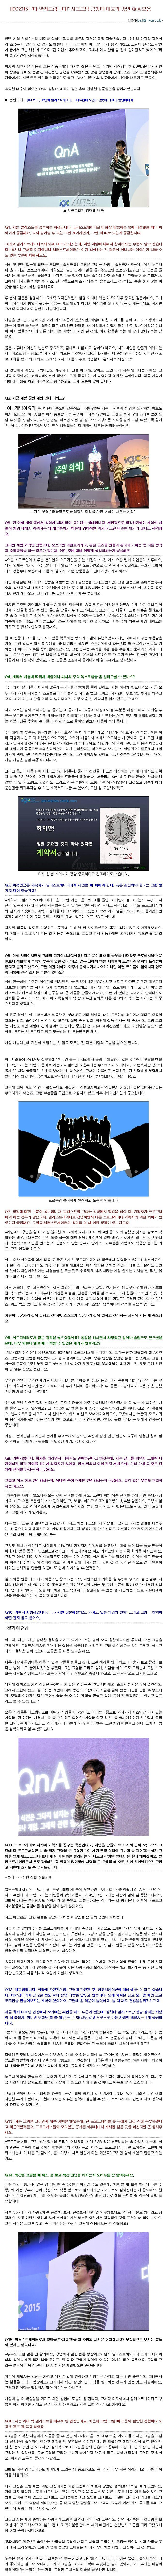 "[IGC2015] ""다 알려드립니다!"" 시프트업 김형태 대표의 강연 QnA 모음"